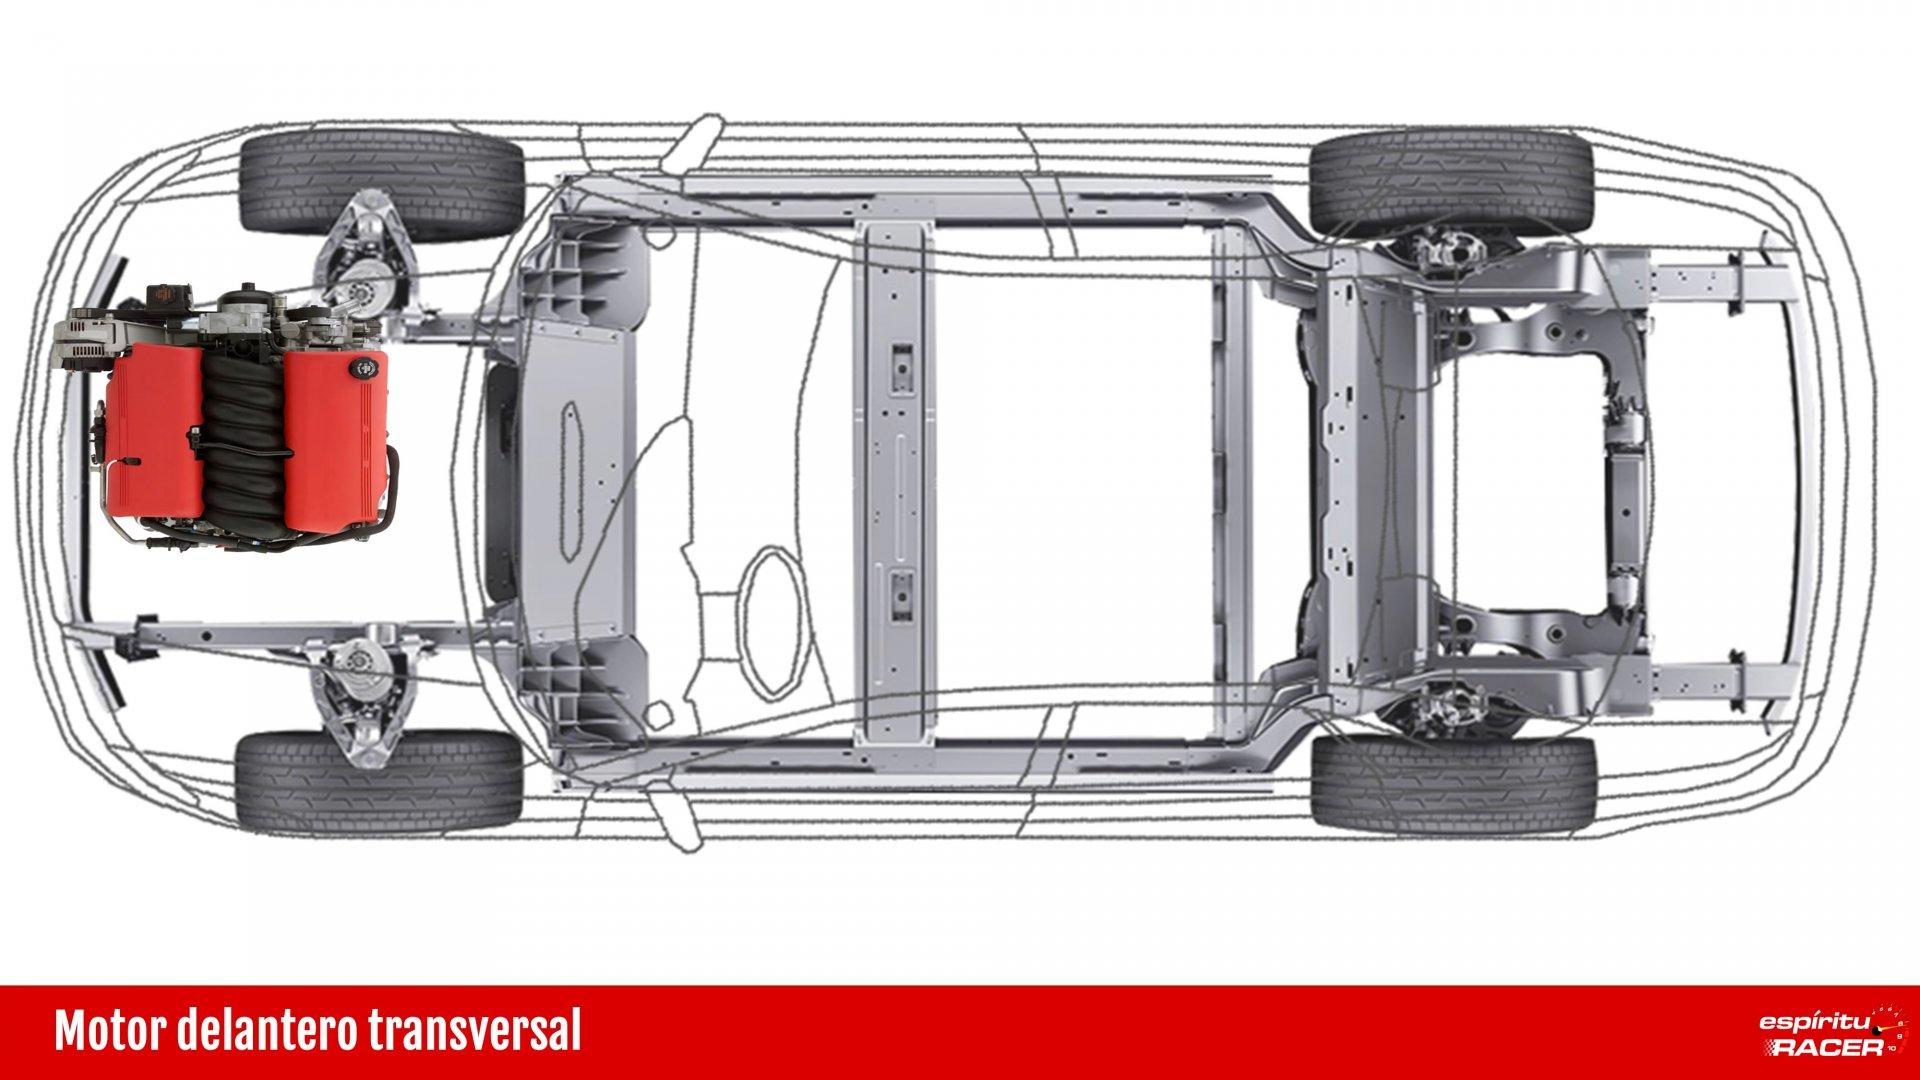 Motor delantero transversal